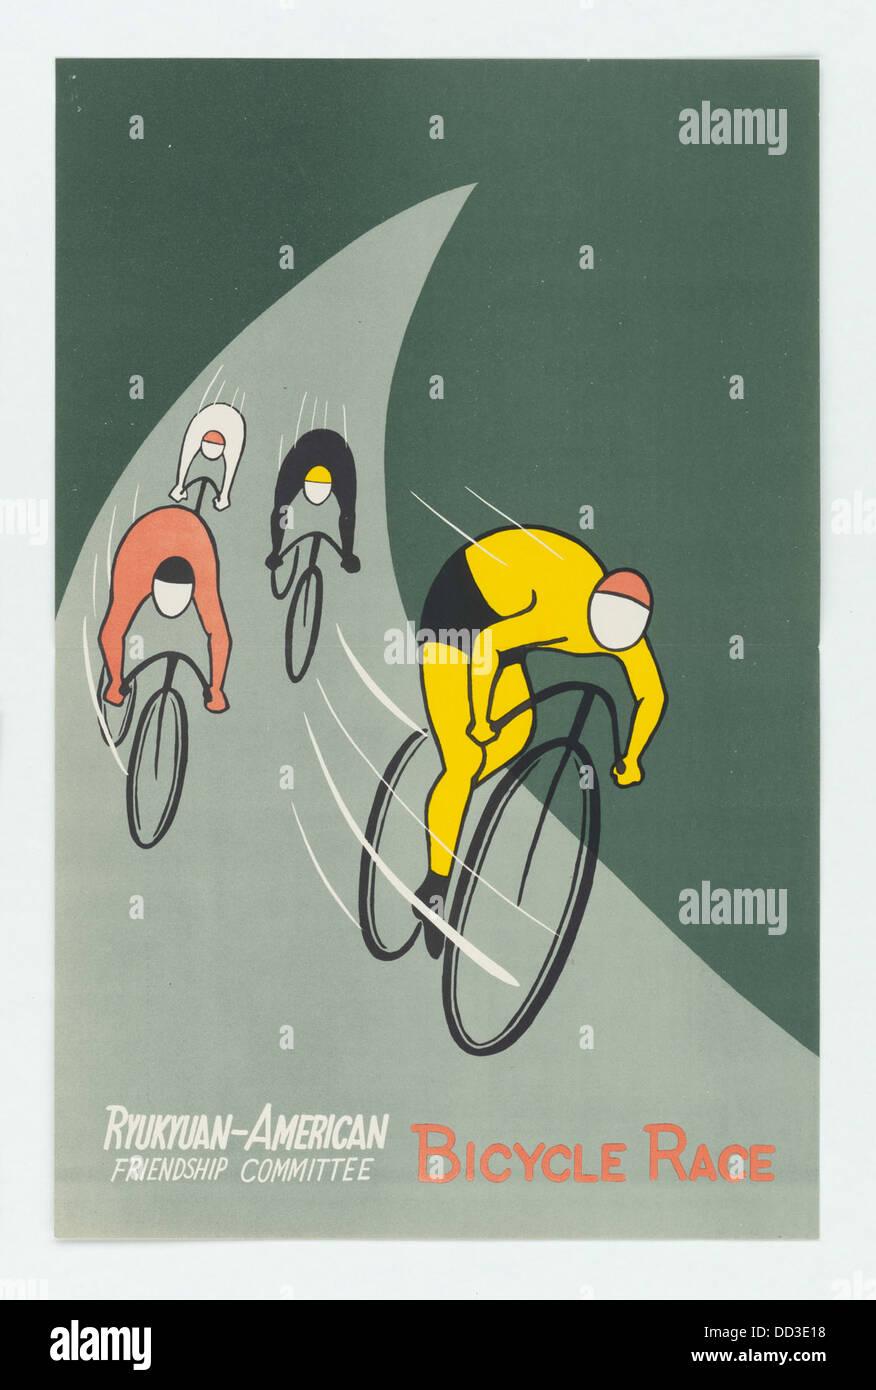 Ryukyuan-American Friendship Committee Bicycle Race - - 5729917 - Stock Image